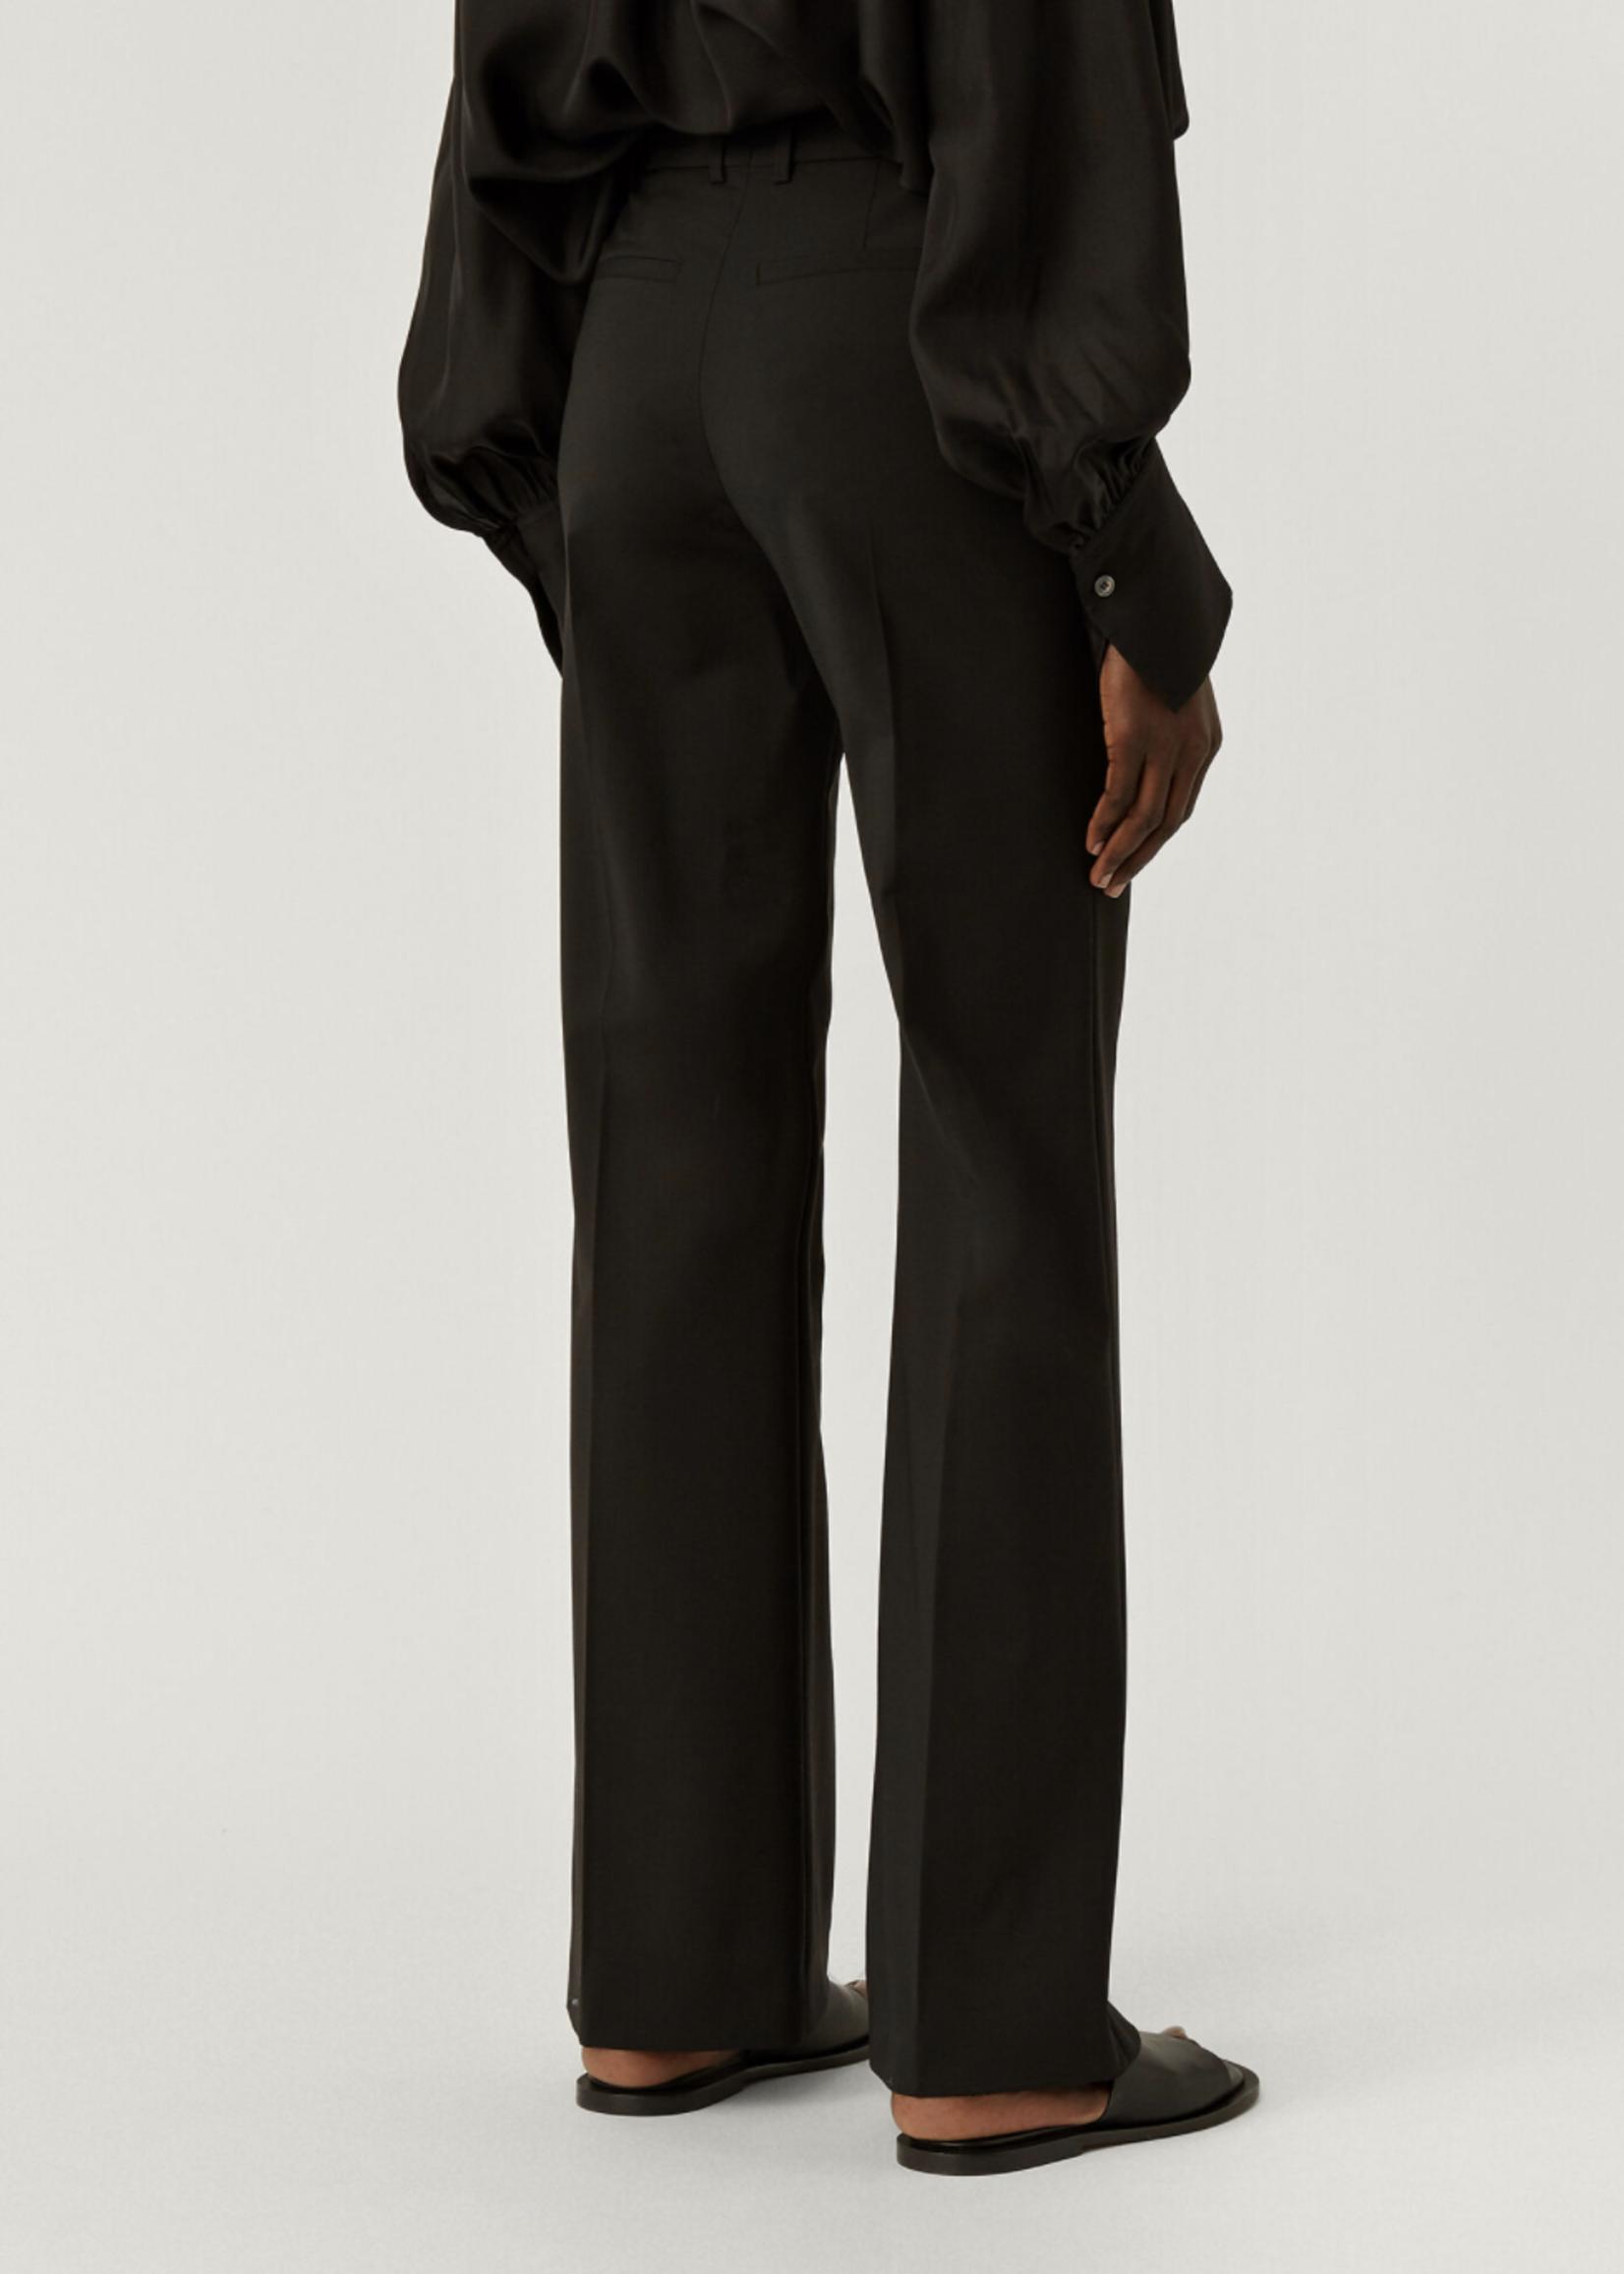 Joseph joseph morissey light wool suiting pants ,black